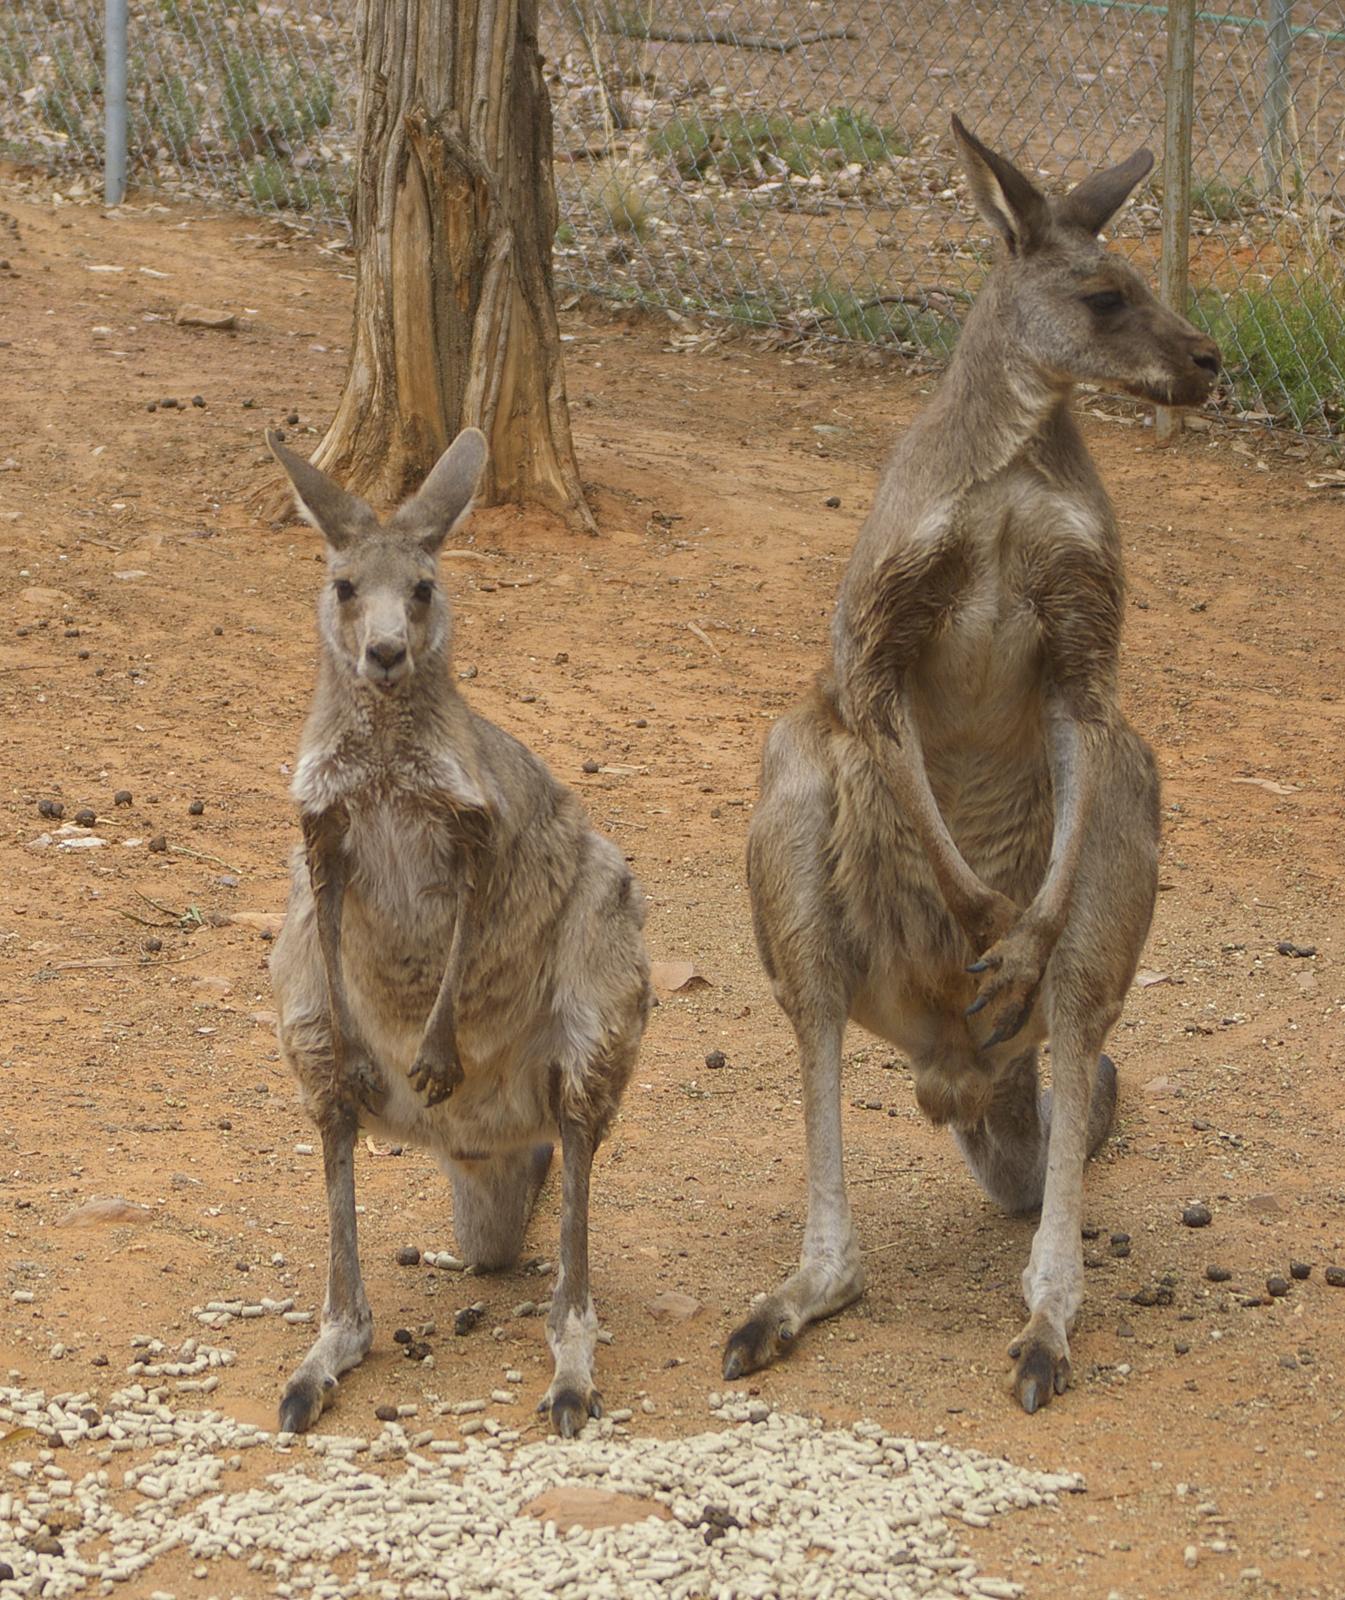 Male grey kangaroo photo